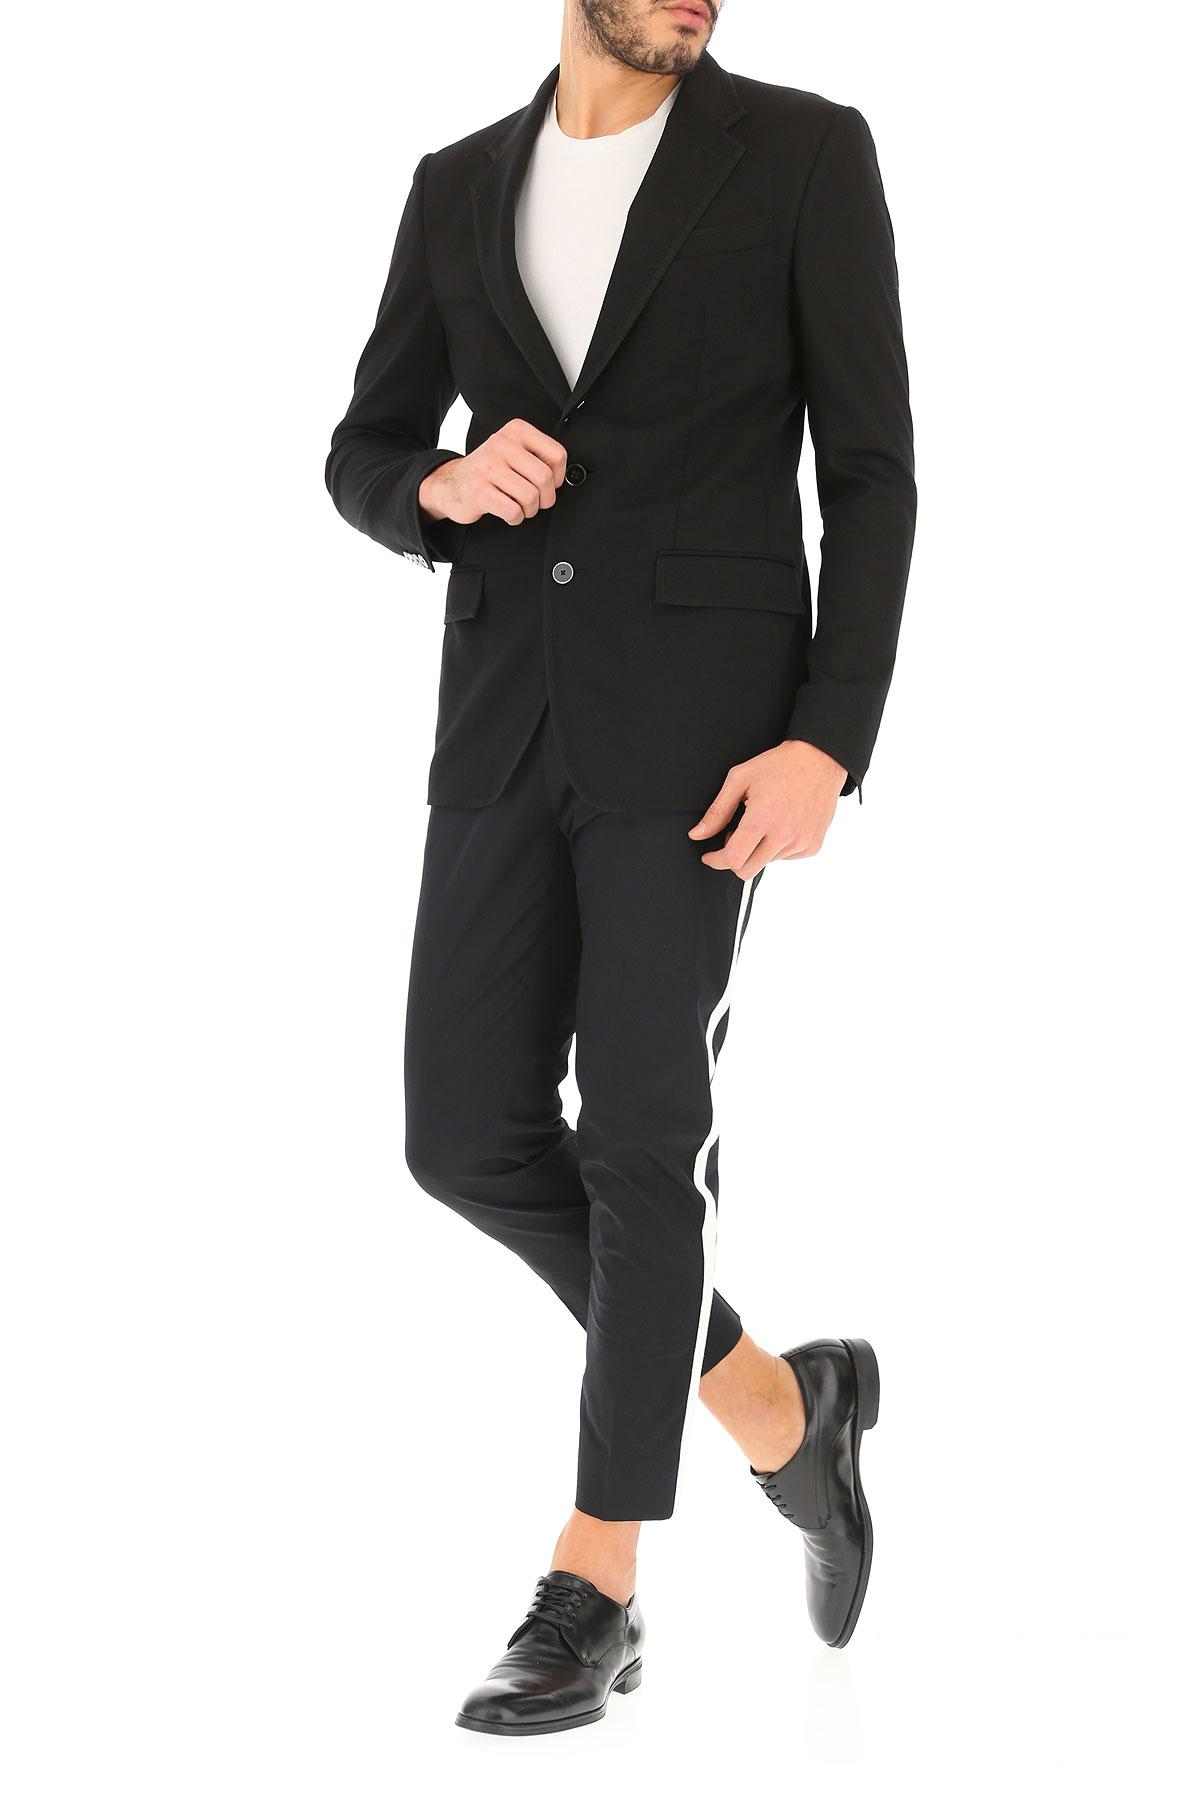 Gabbana Negro nbsp; 2019 verano Ropa Dolce Hombres Para Primavera amp; 5xqqPwCU